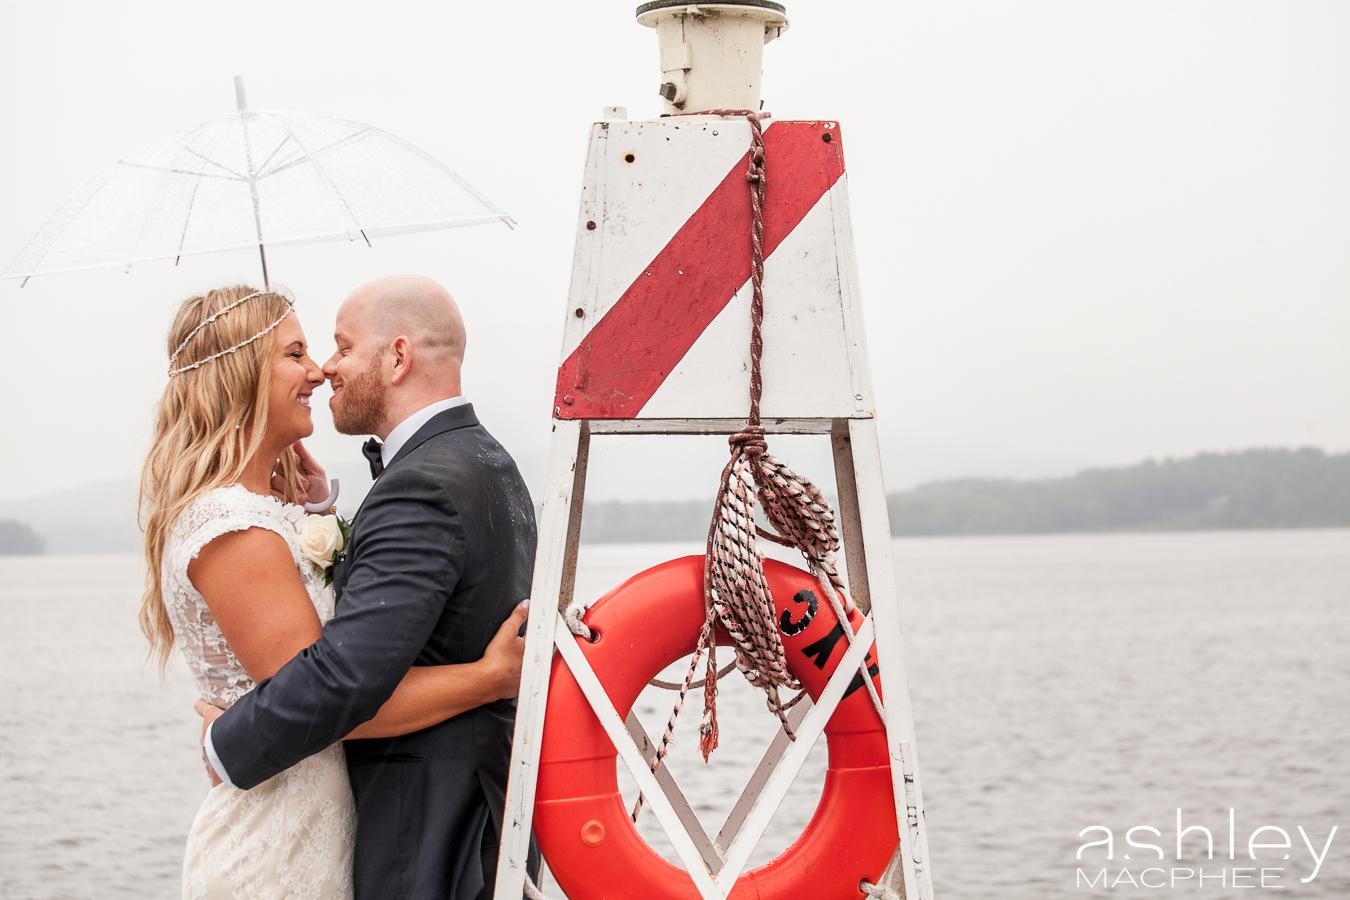 Ashley MacPhee Photography Hudson Yacht Club wedding photographer (70 of 112).jpg